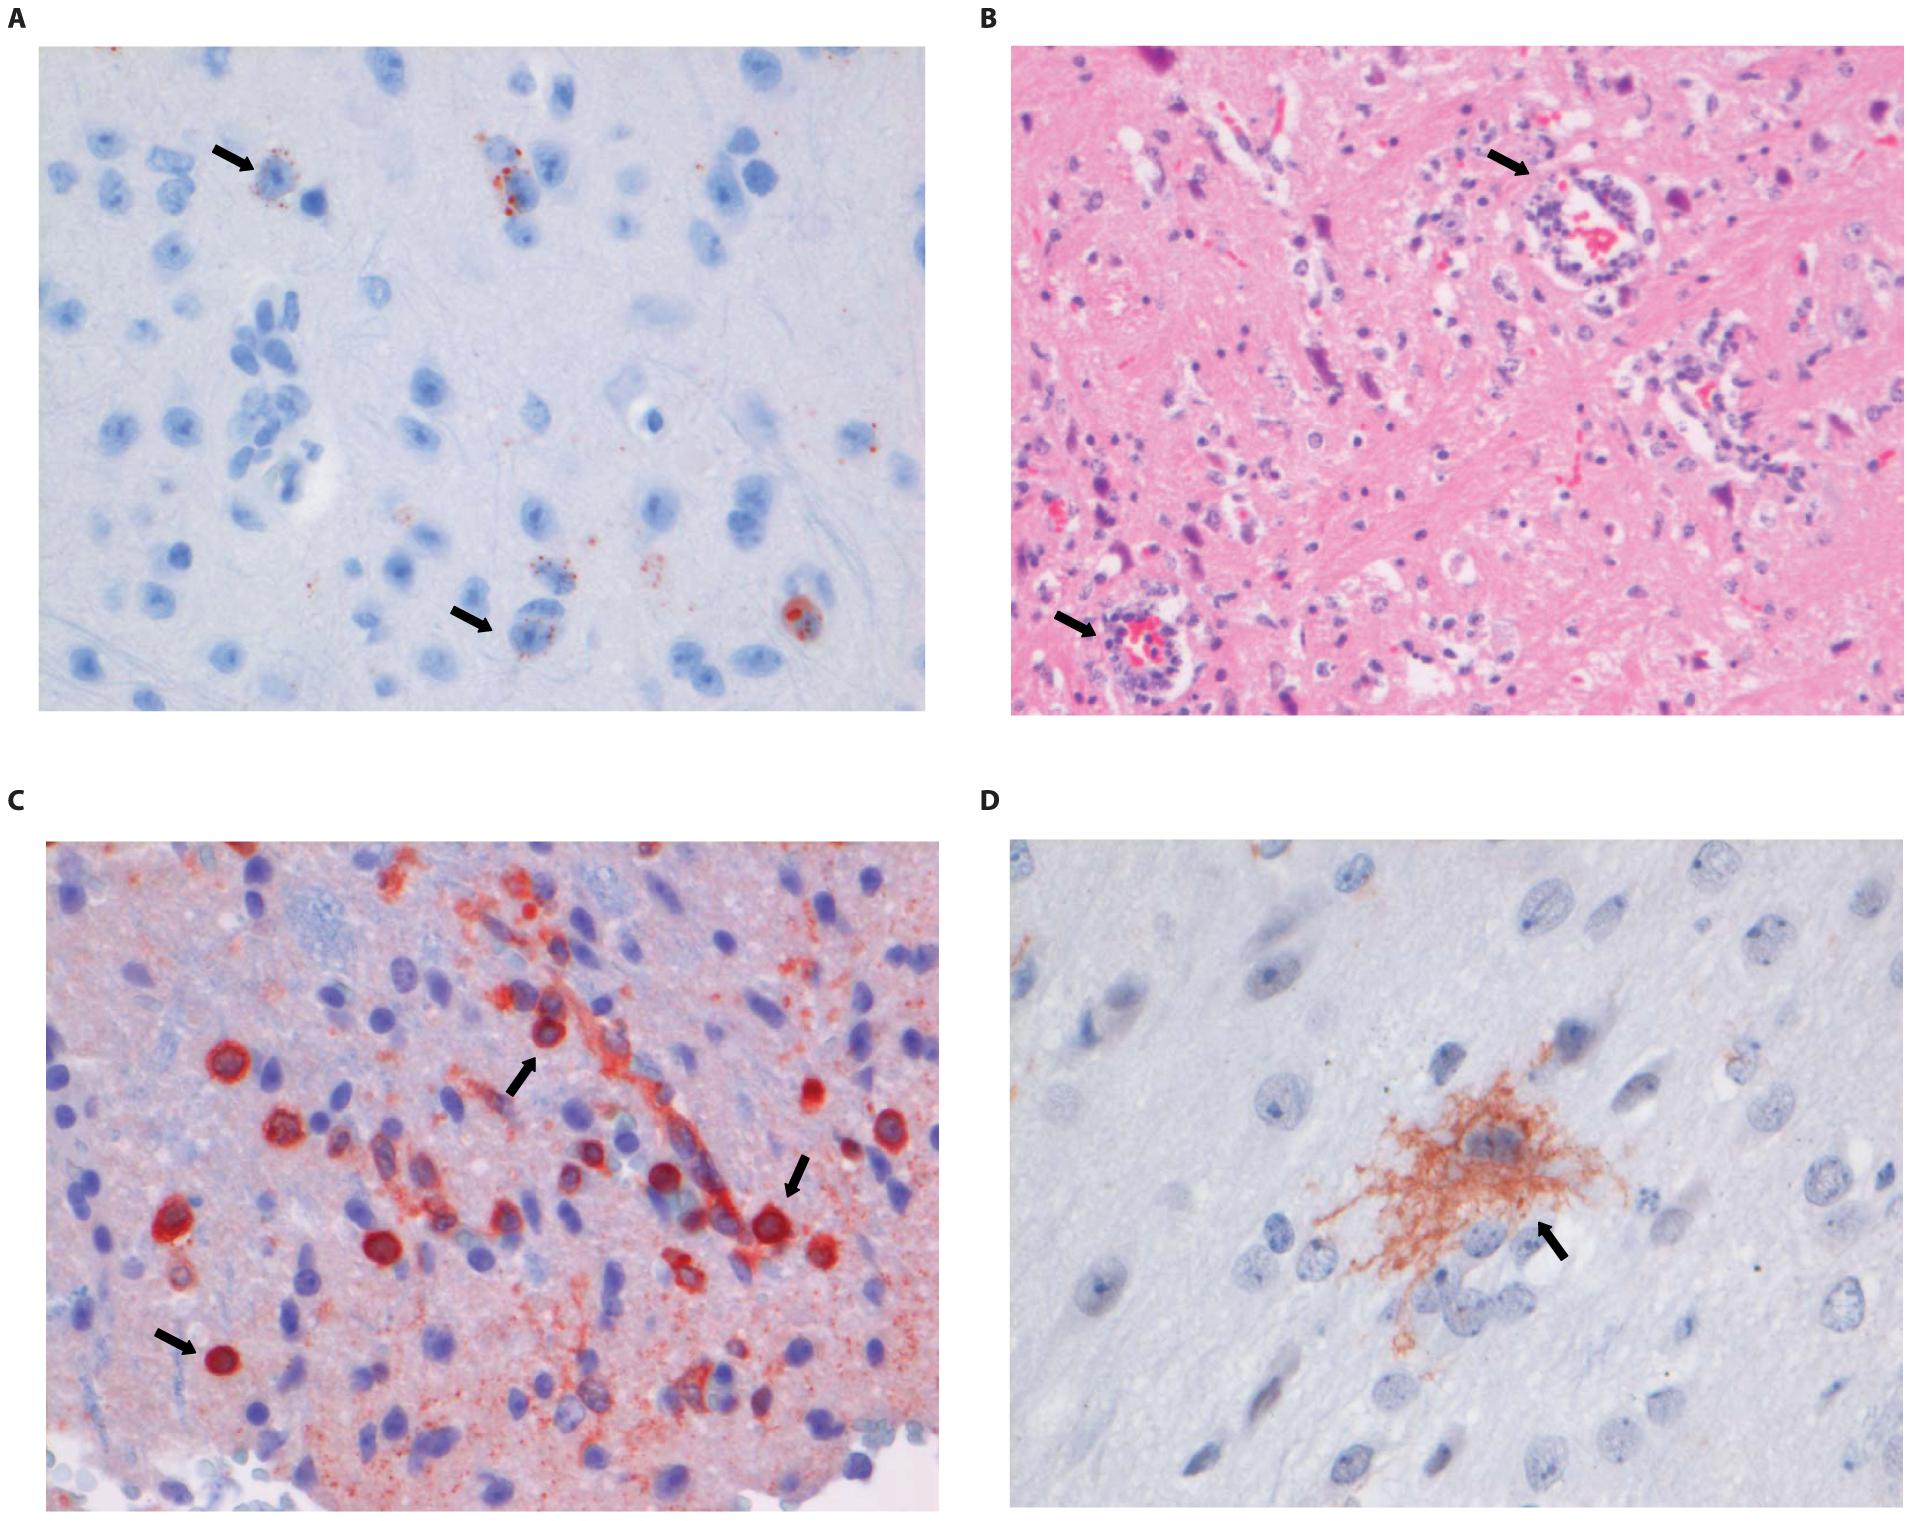 Histopathology of 8-week old BALB/c mice infected i.m. with 10<sup>6</sup> TCID<sub>50</sub> of DUVV-NL07.